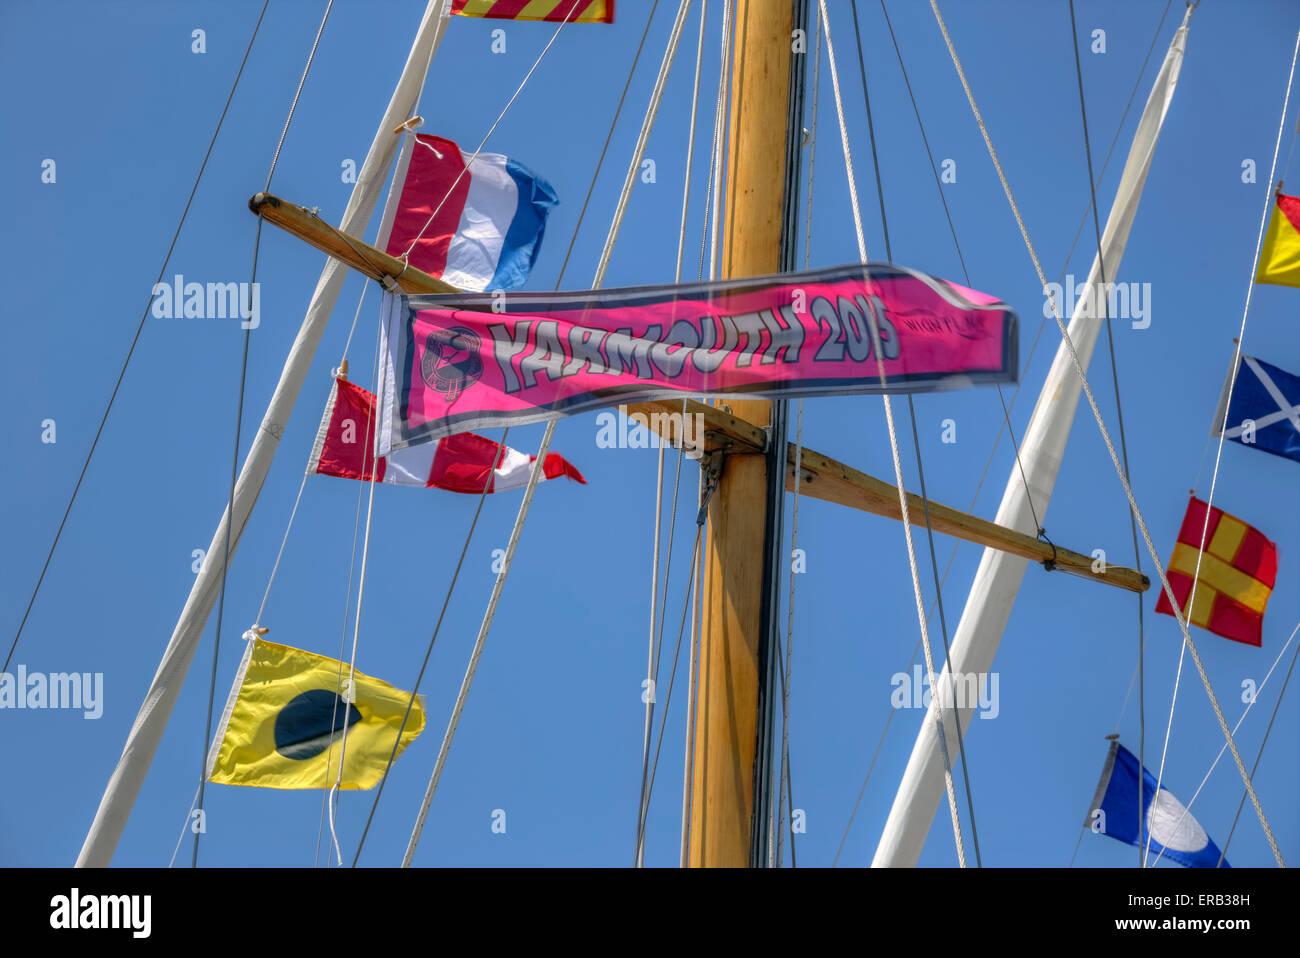 Old Gaffers Festival, Yarmouth, Isle of Wight, Hampshire, England, United Kingdom Stock Photo